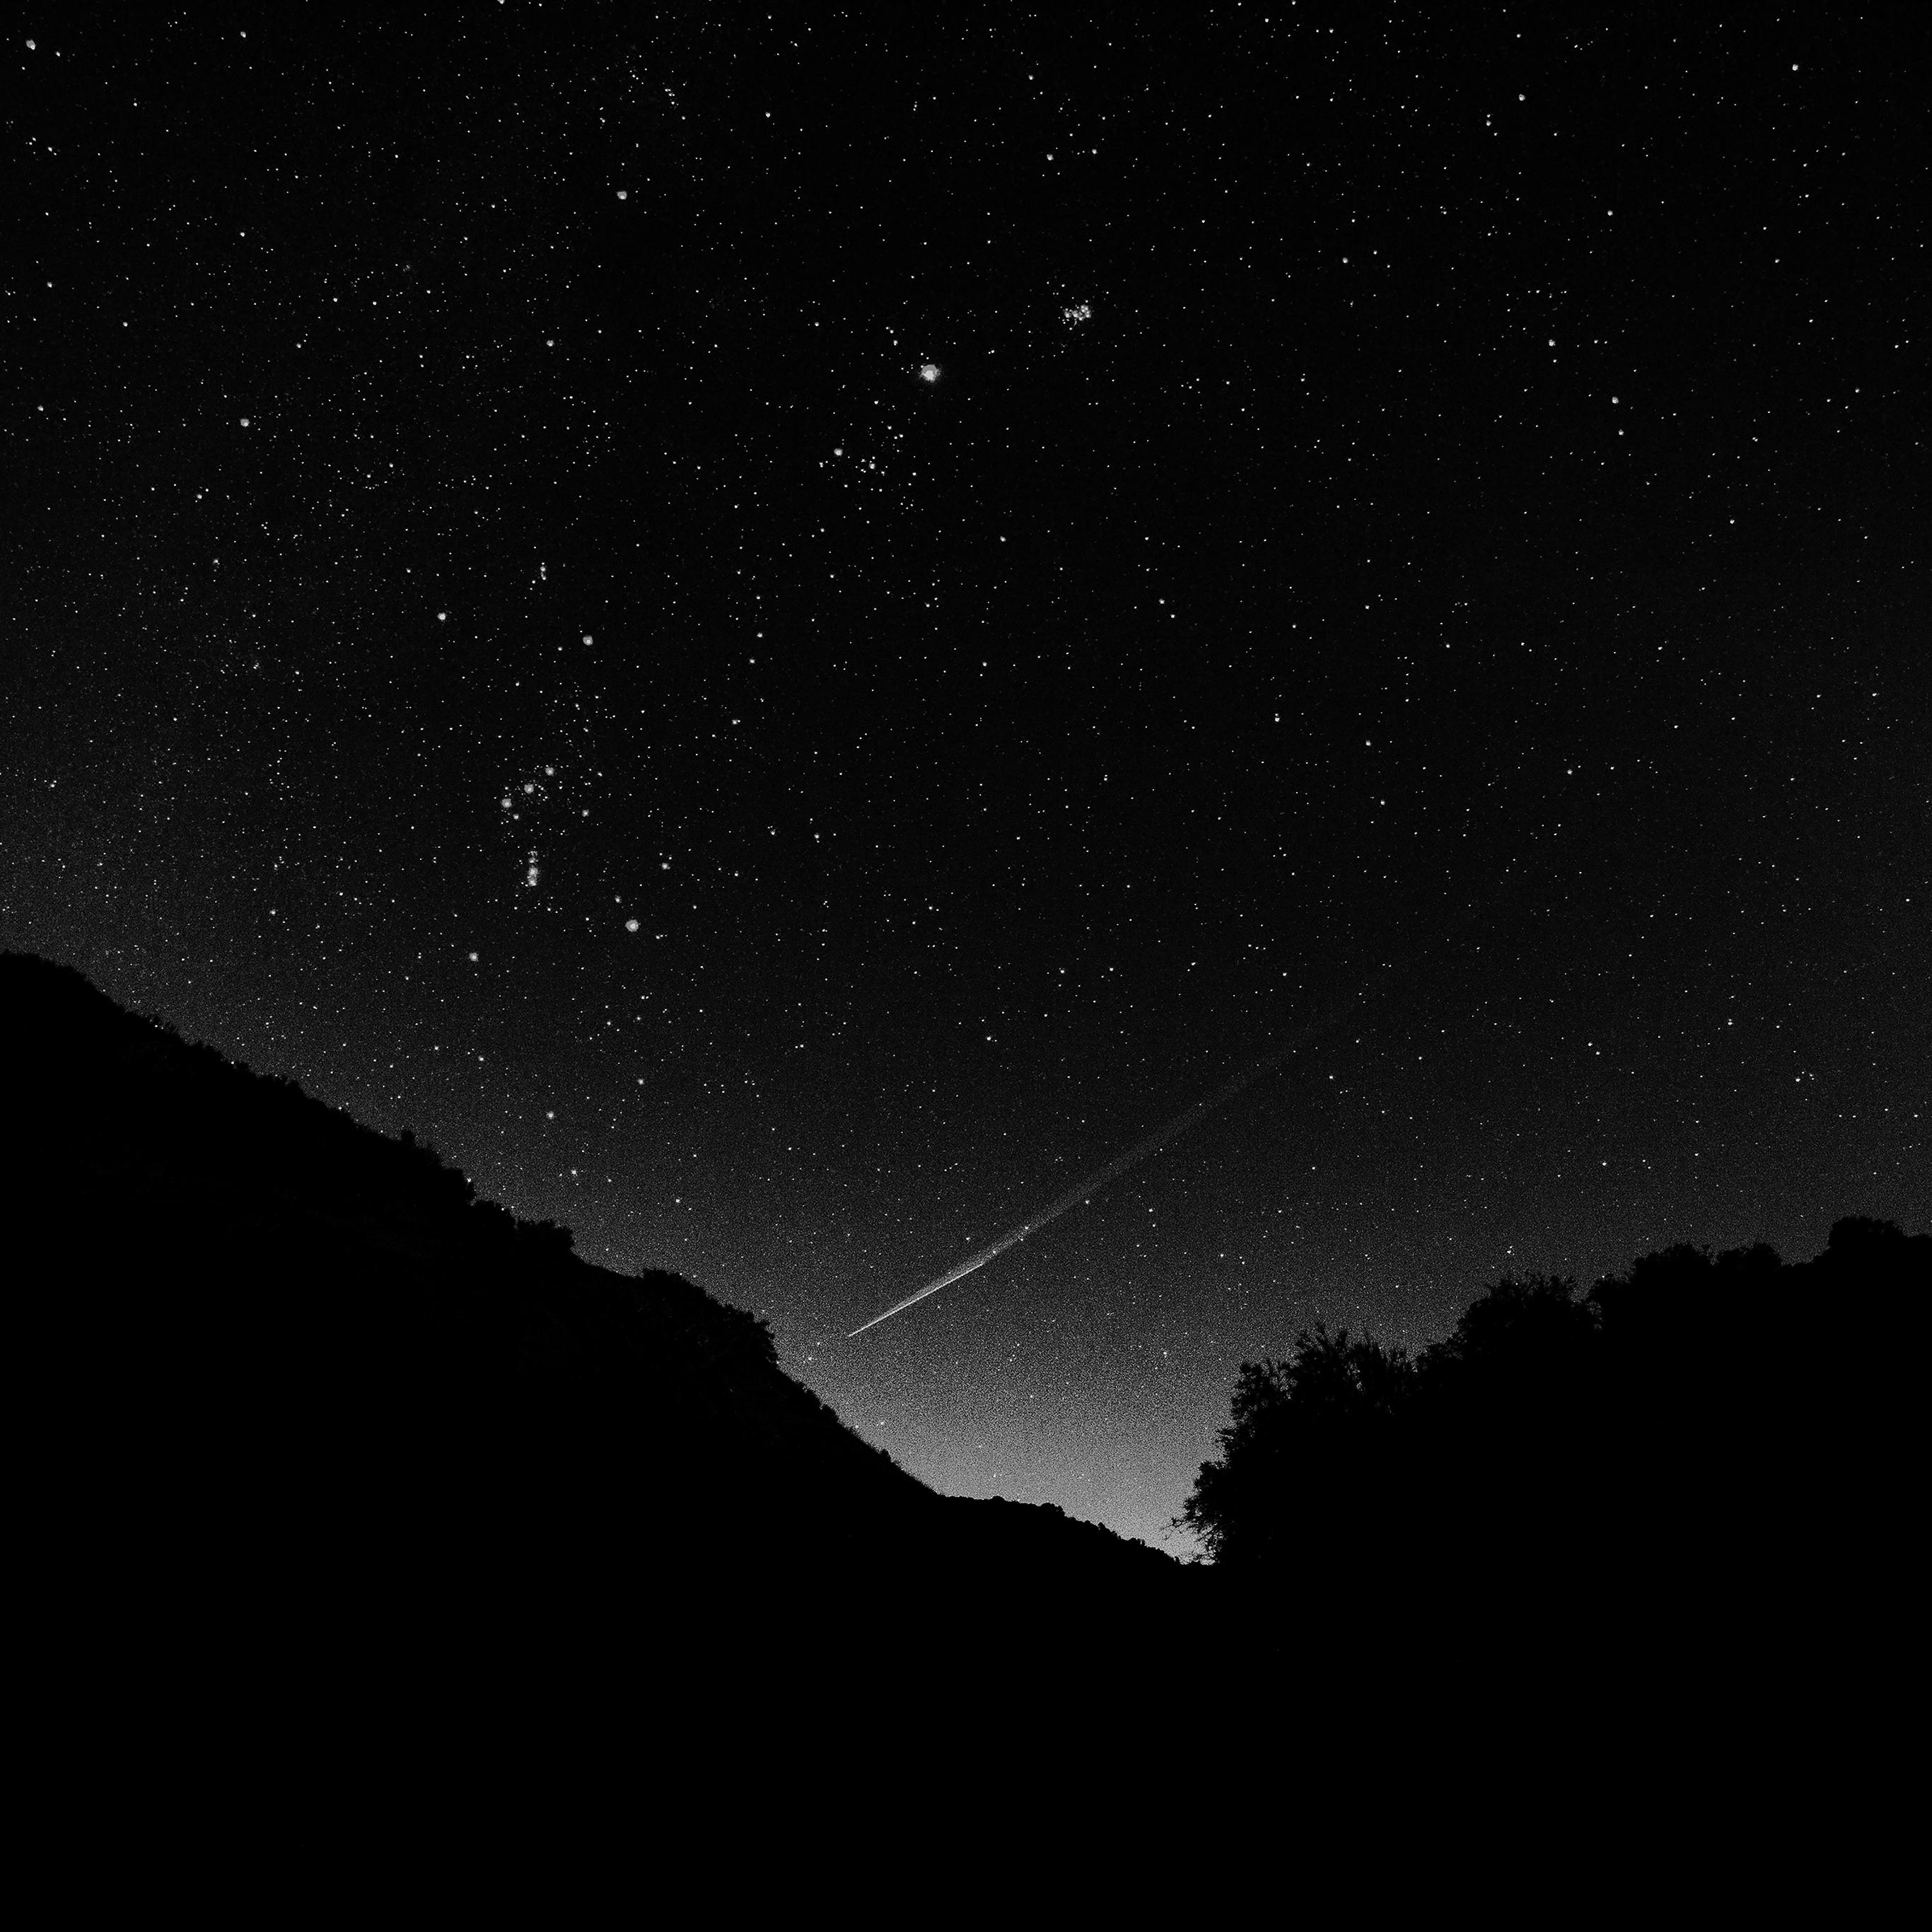 Best Apple Logo Iphone Wallpaper: Mg37-astronomy-space-black-sky-night-beautiful-falling